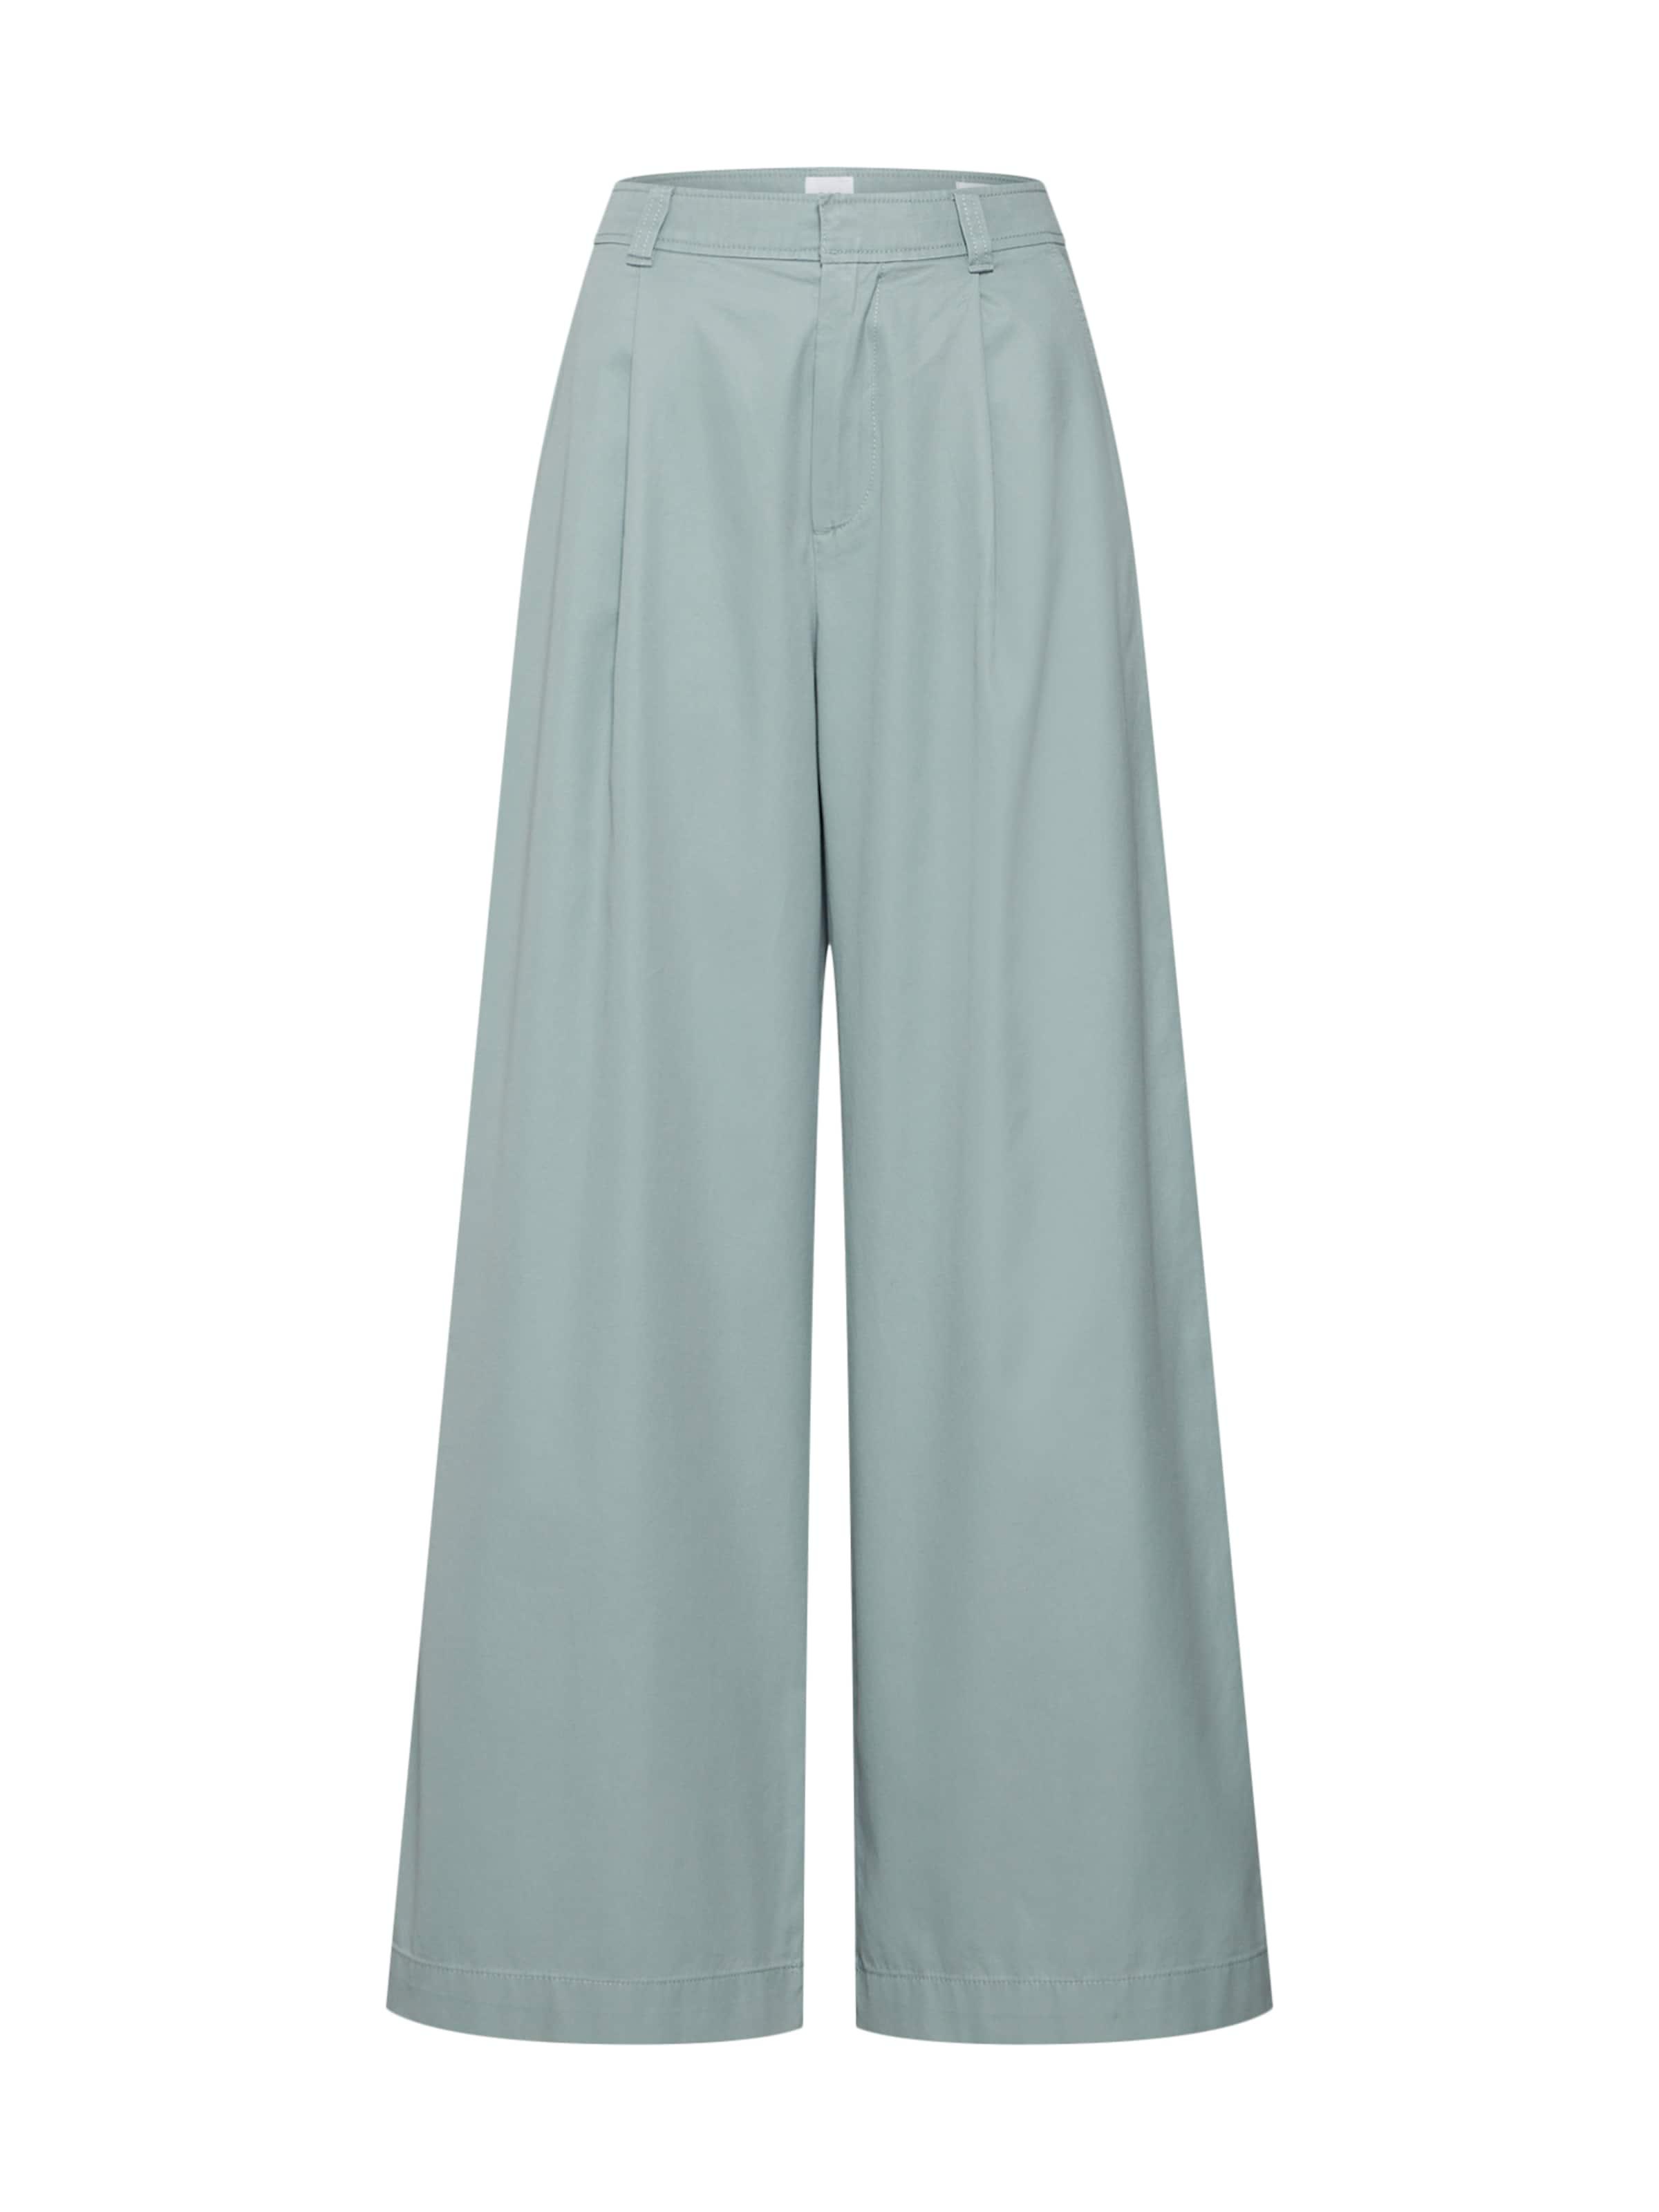 Pantalon Vert risepleatedwidelegjpn' Gap Pince À 'hi En UVLzqpMGS